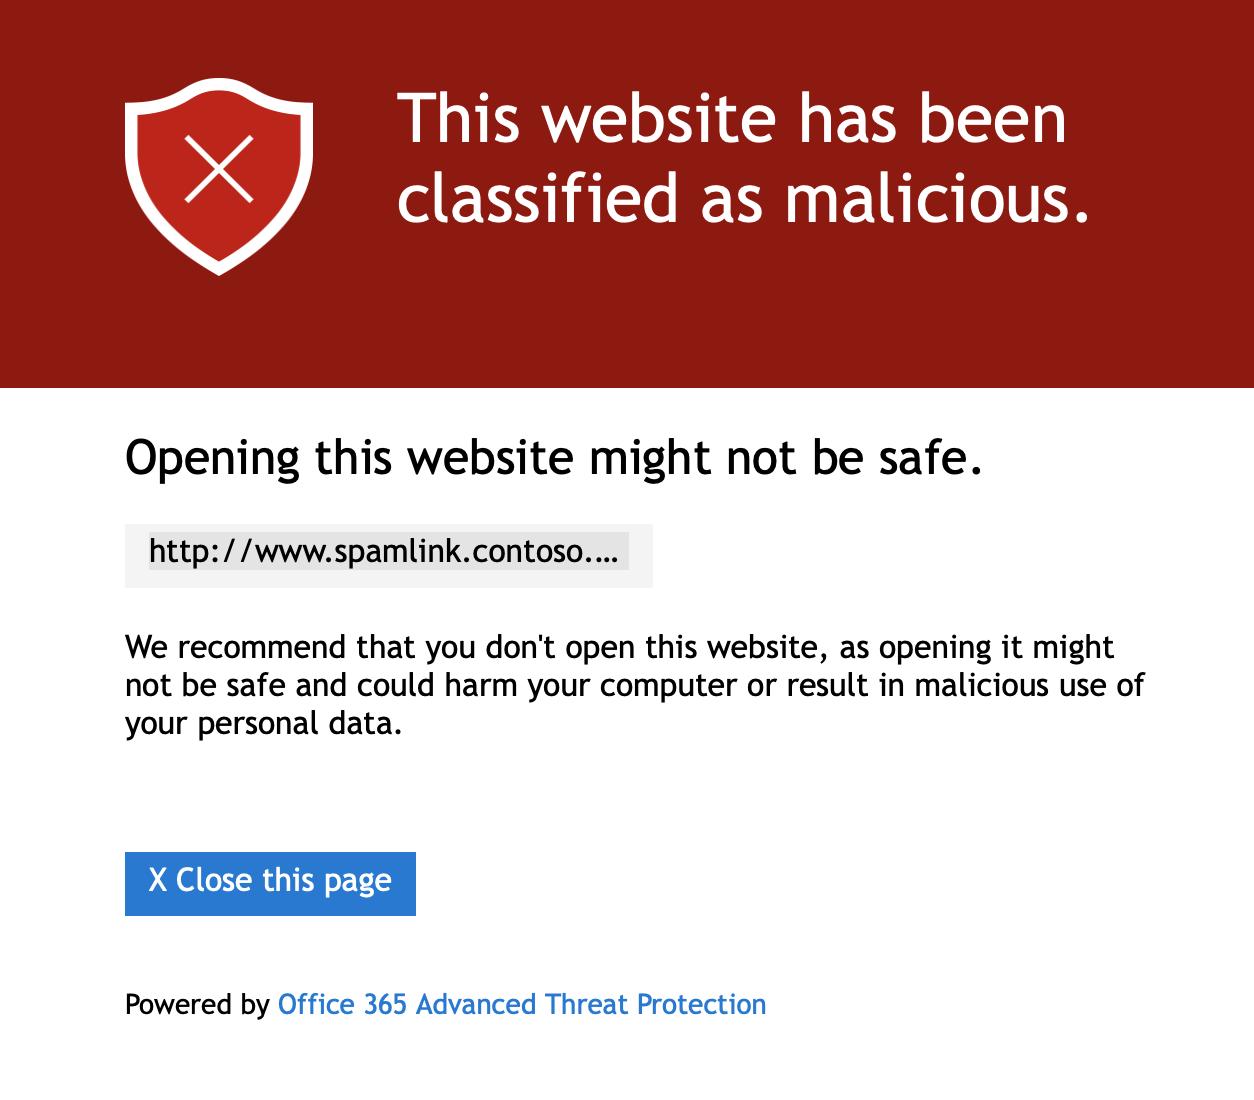 Malicious website warning